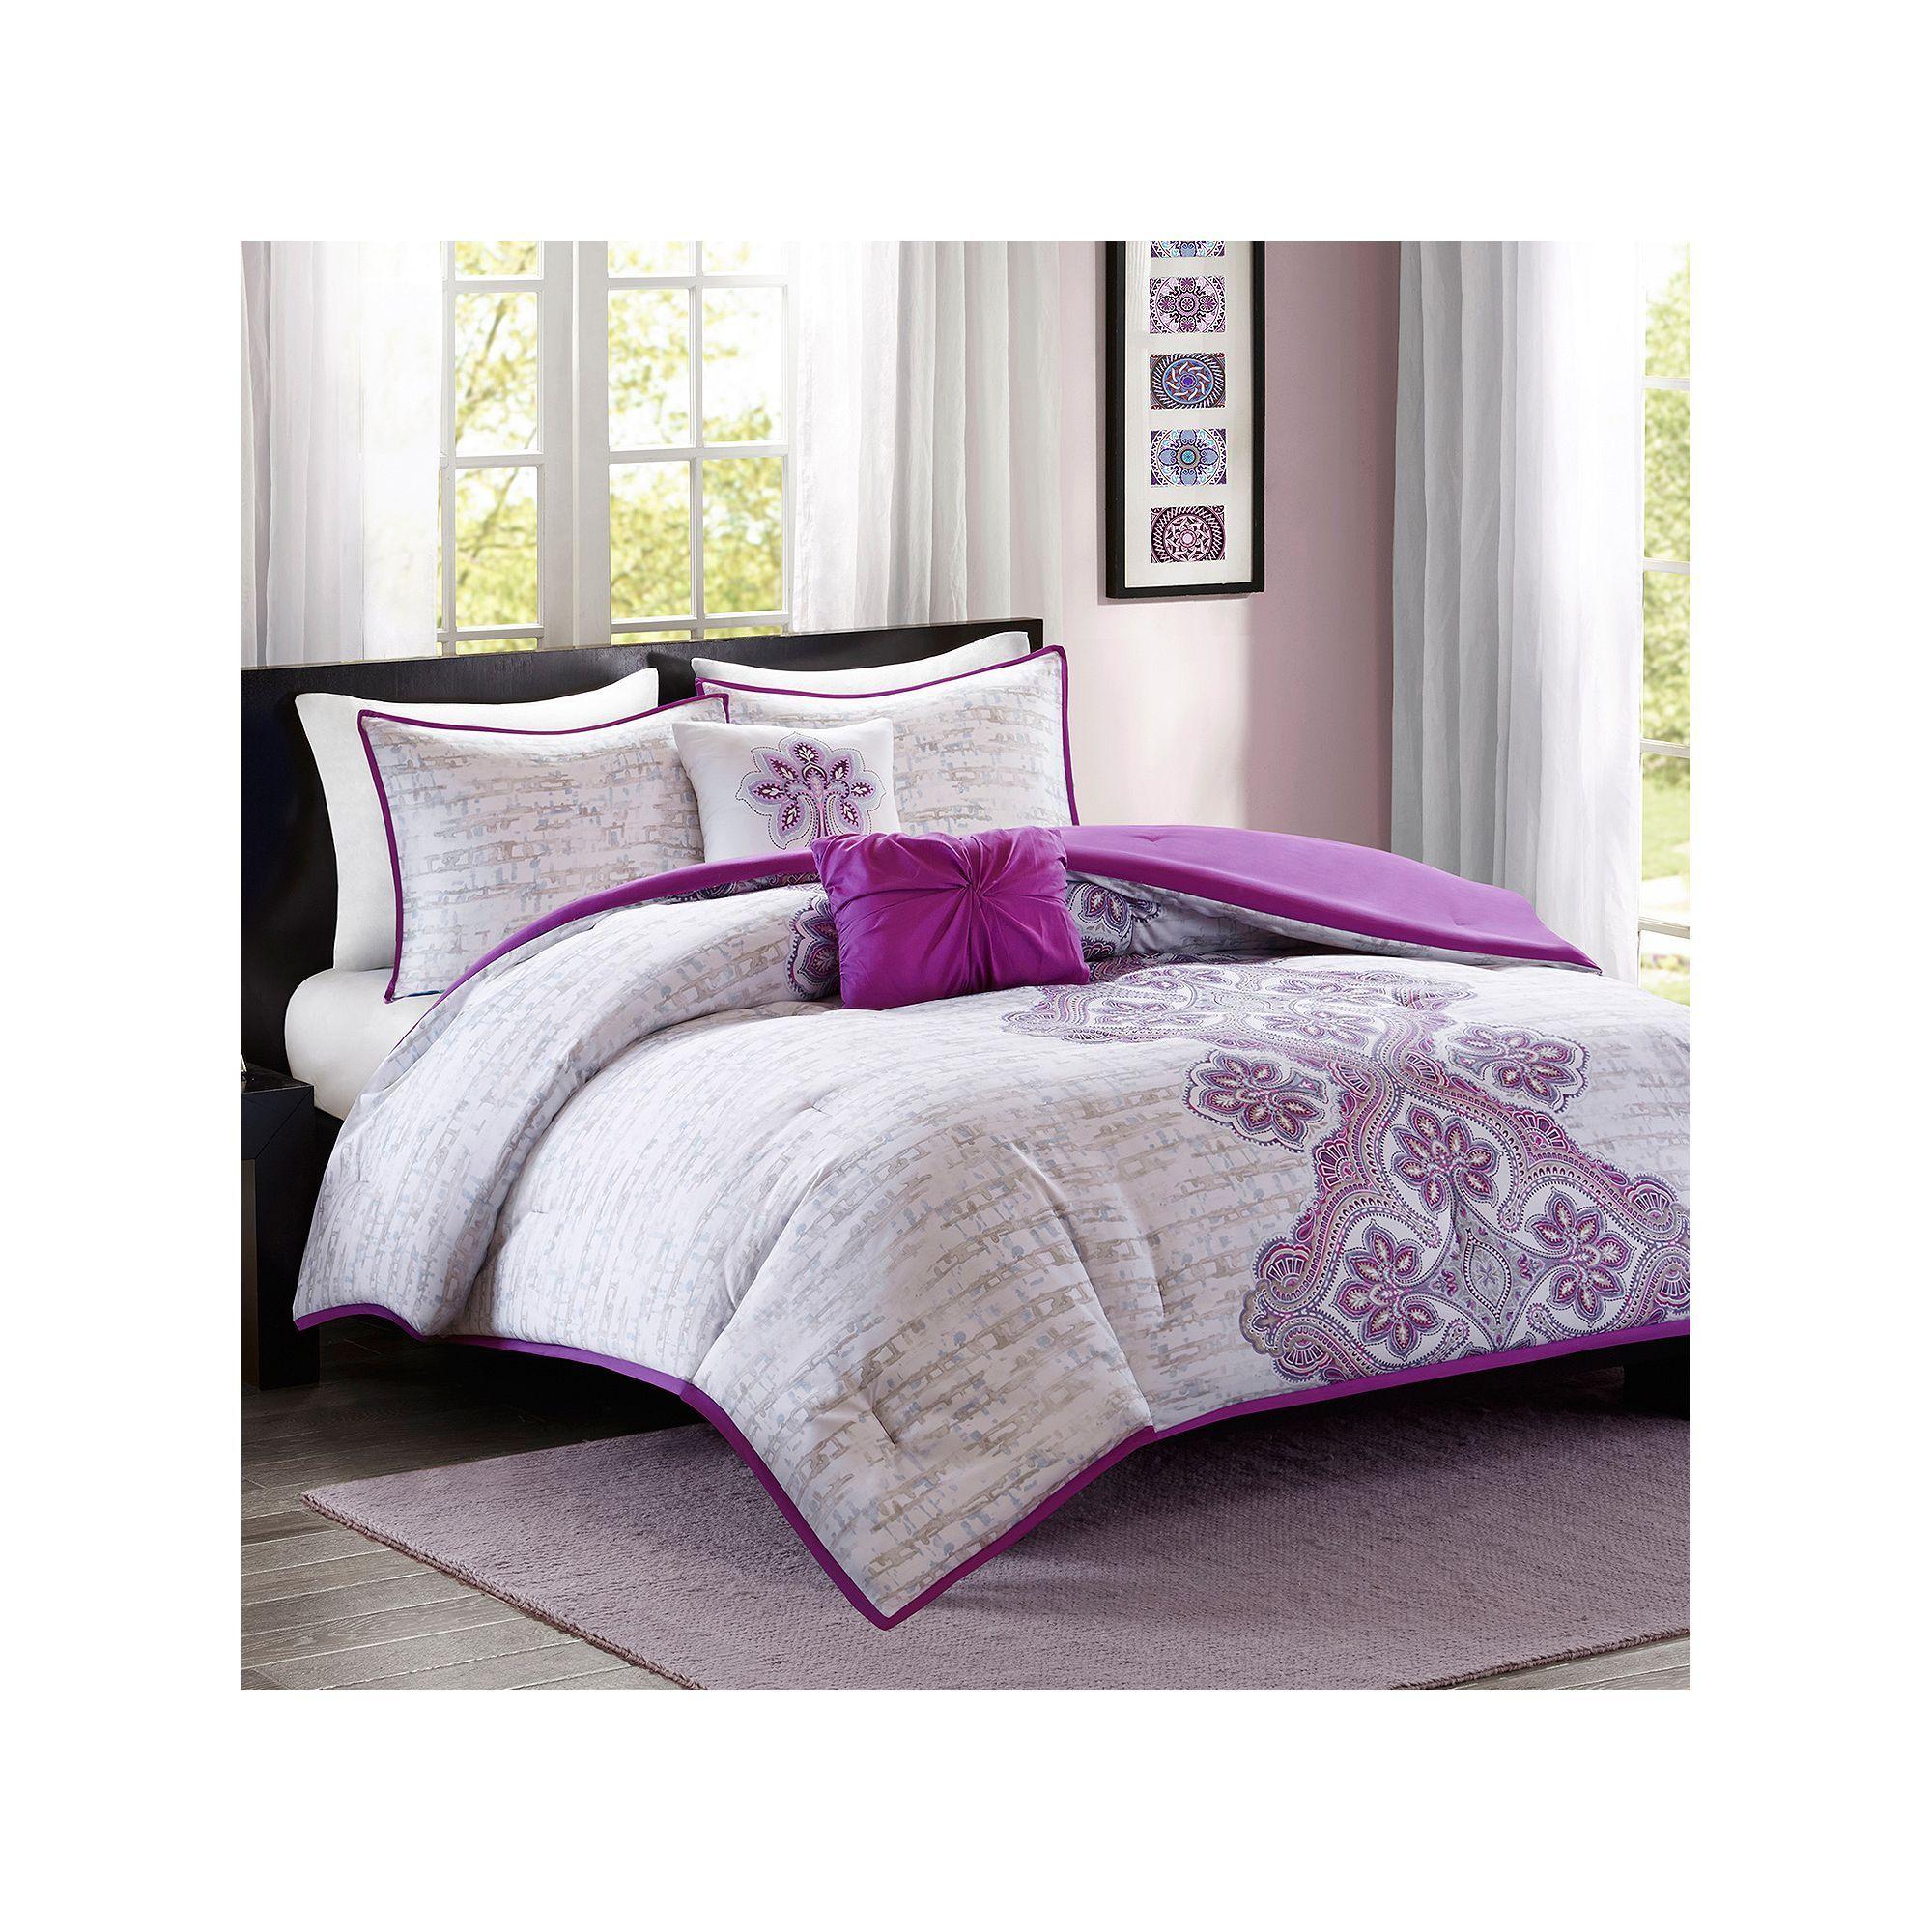 Intelligent Design Hannah Comforter Set, Purple